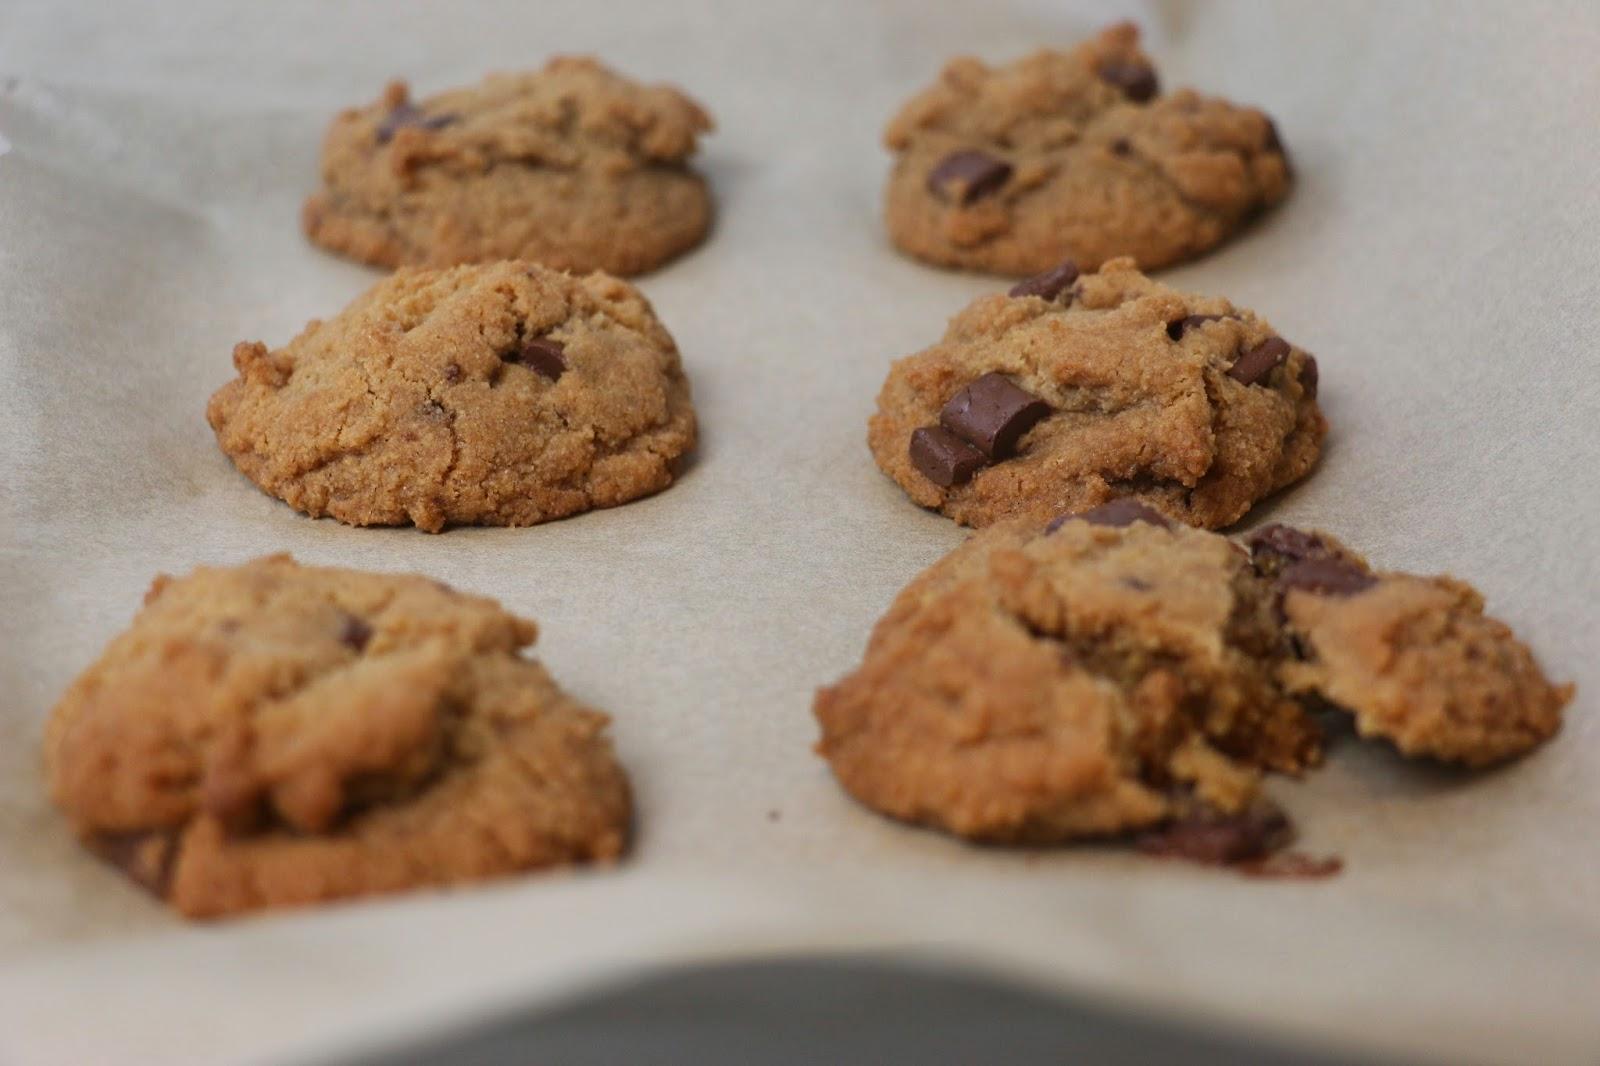 Midnight Baking: Vegan Gluten Free Chocolate Chip Cookies